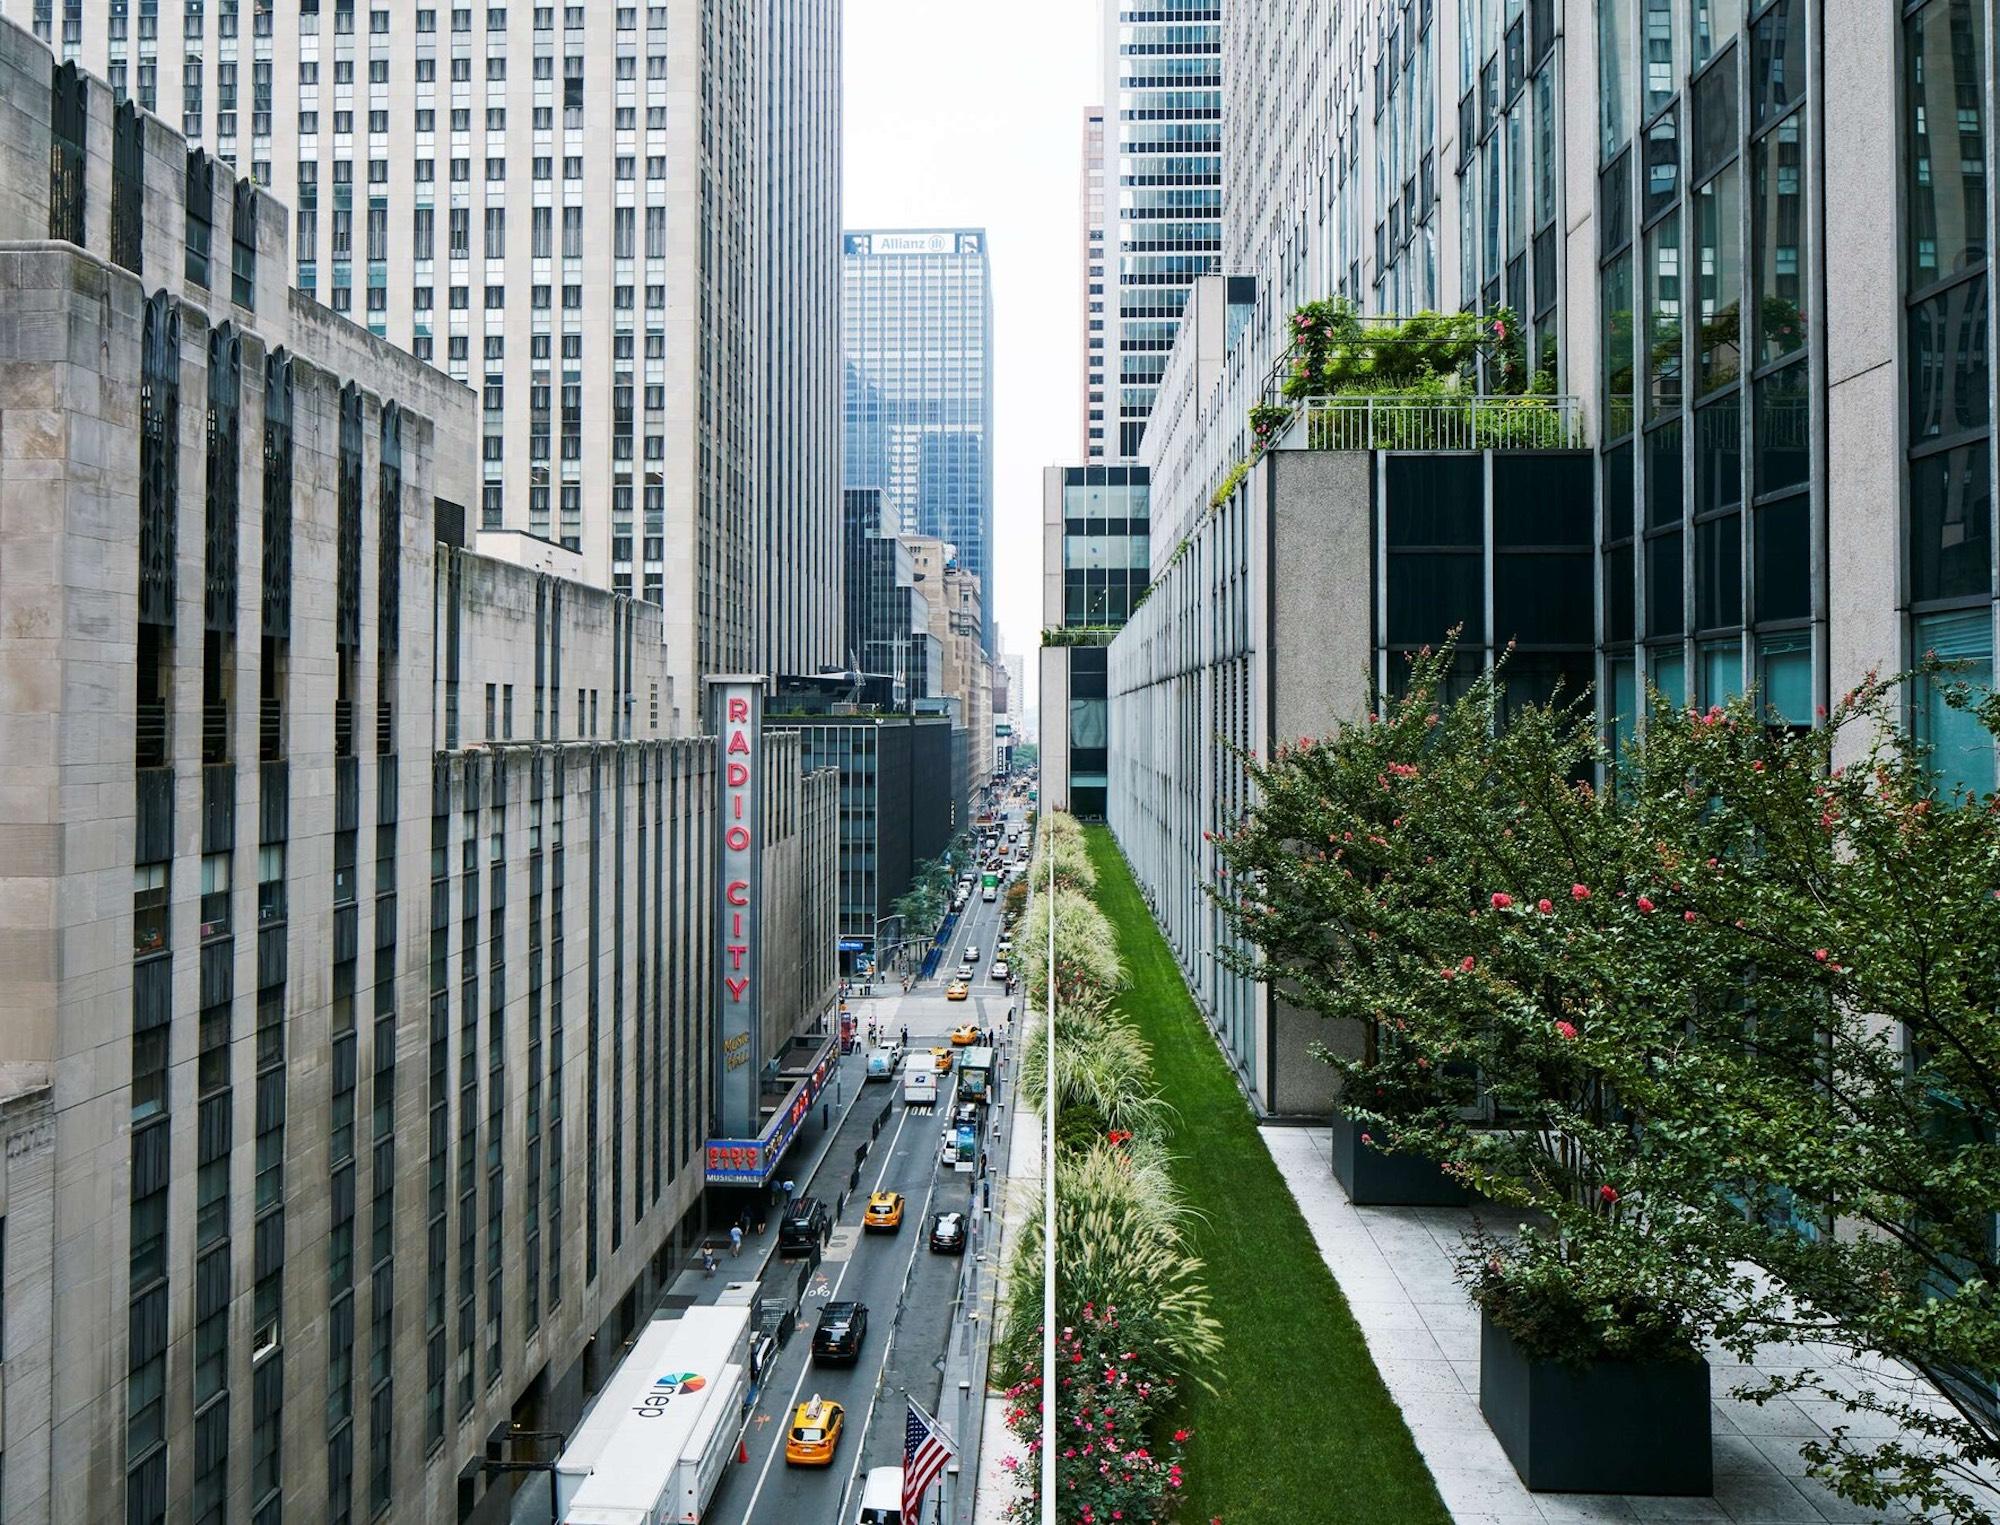 New Radisson Hotels New York